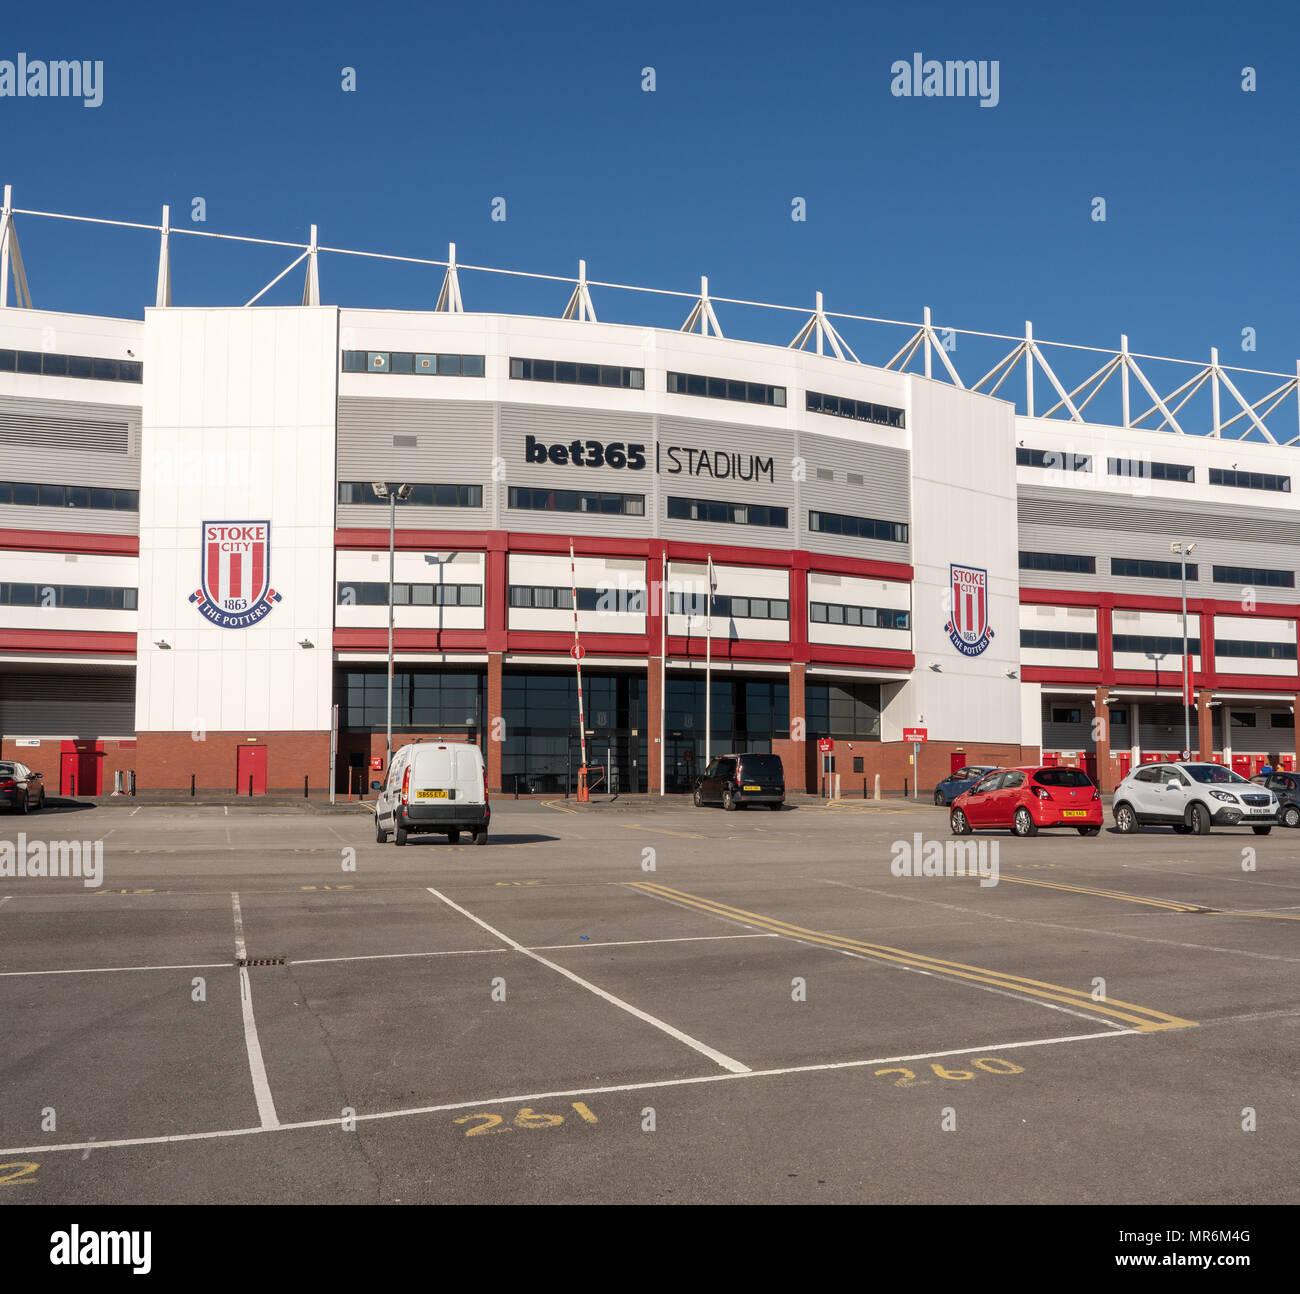 Entrance to Stoke City football stadium - Stock Image